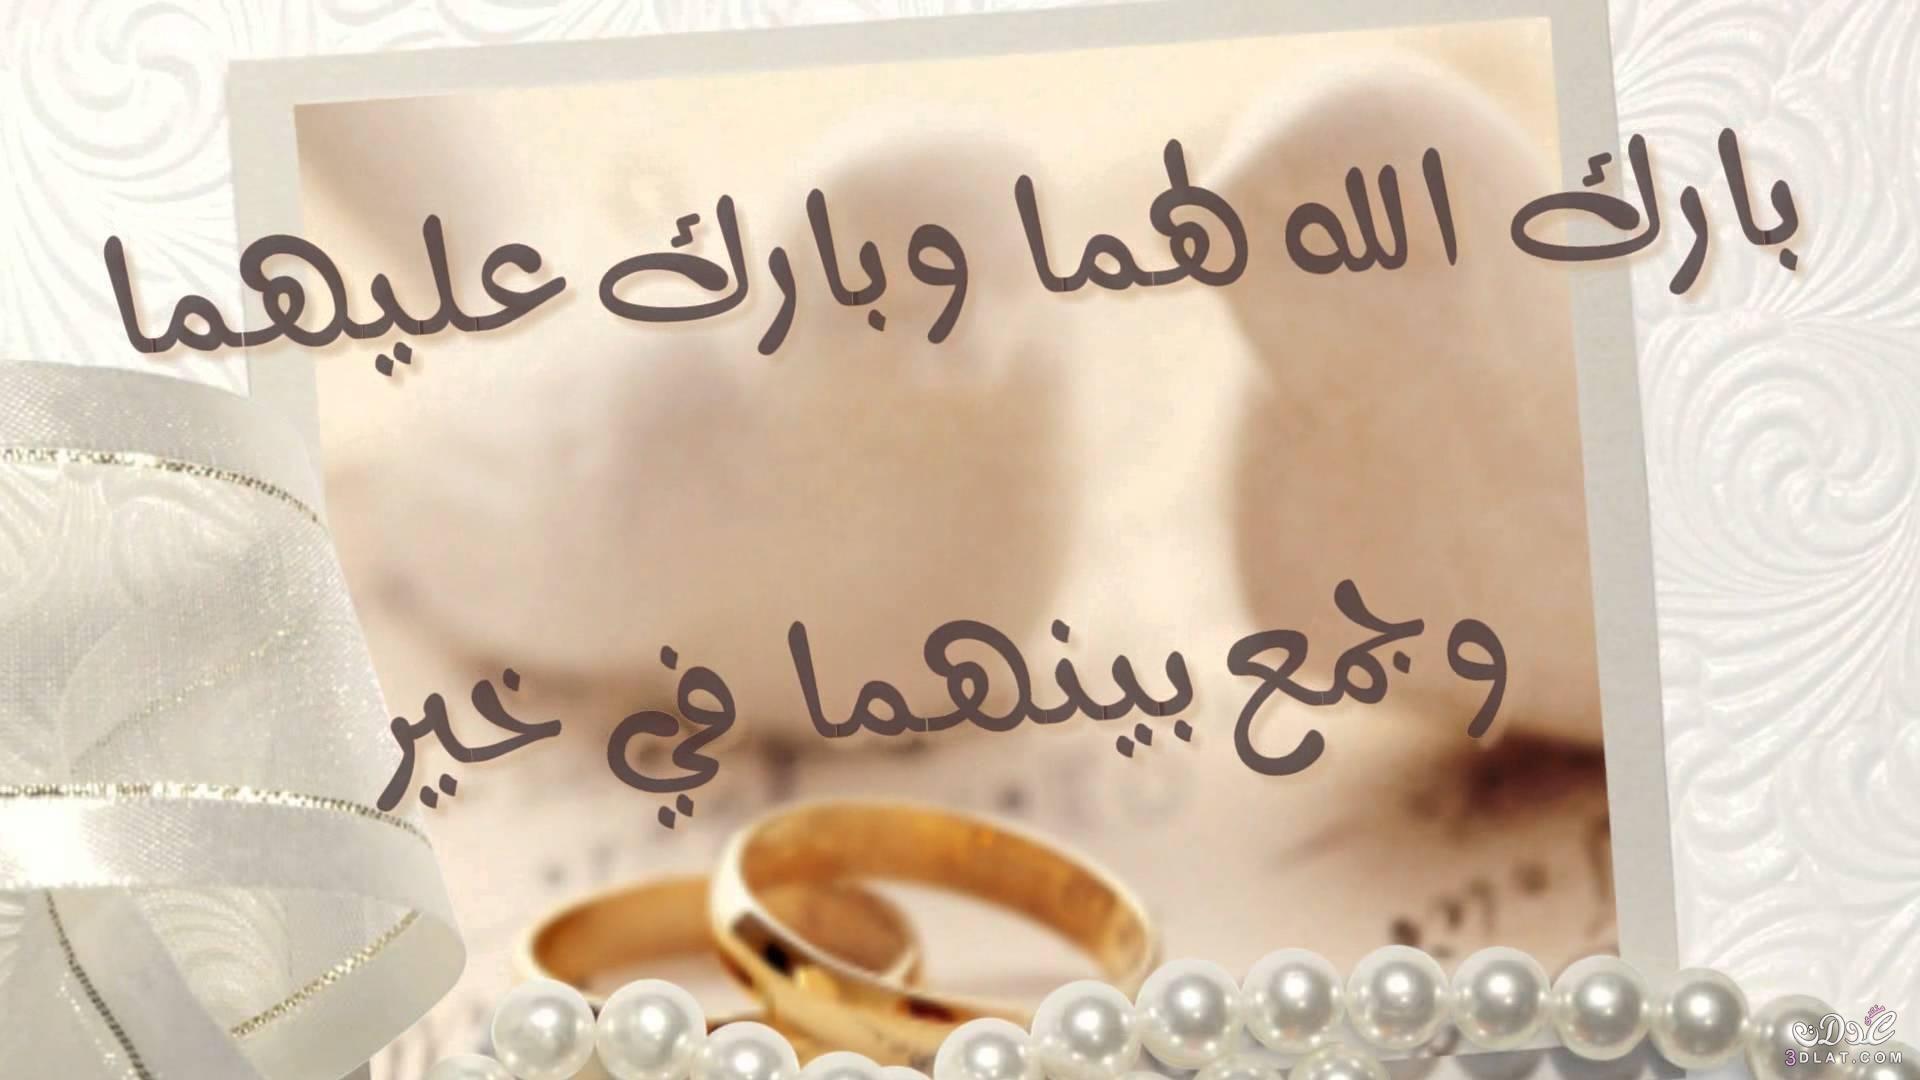 بطاقات زواج سعيد للعروسين اجدد بطاقات تهنئة 3dlat Net 30 17 6388 Projects To Try Wedding Sneaker Love Quotes